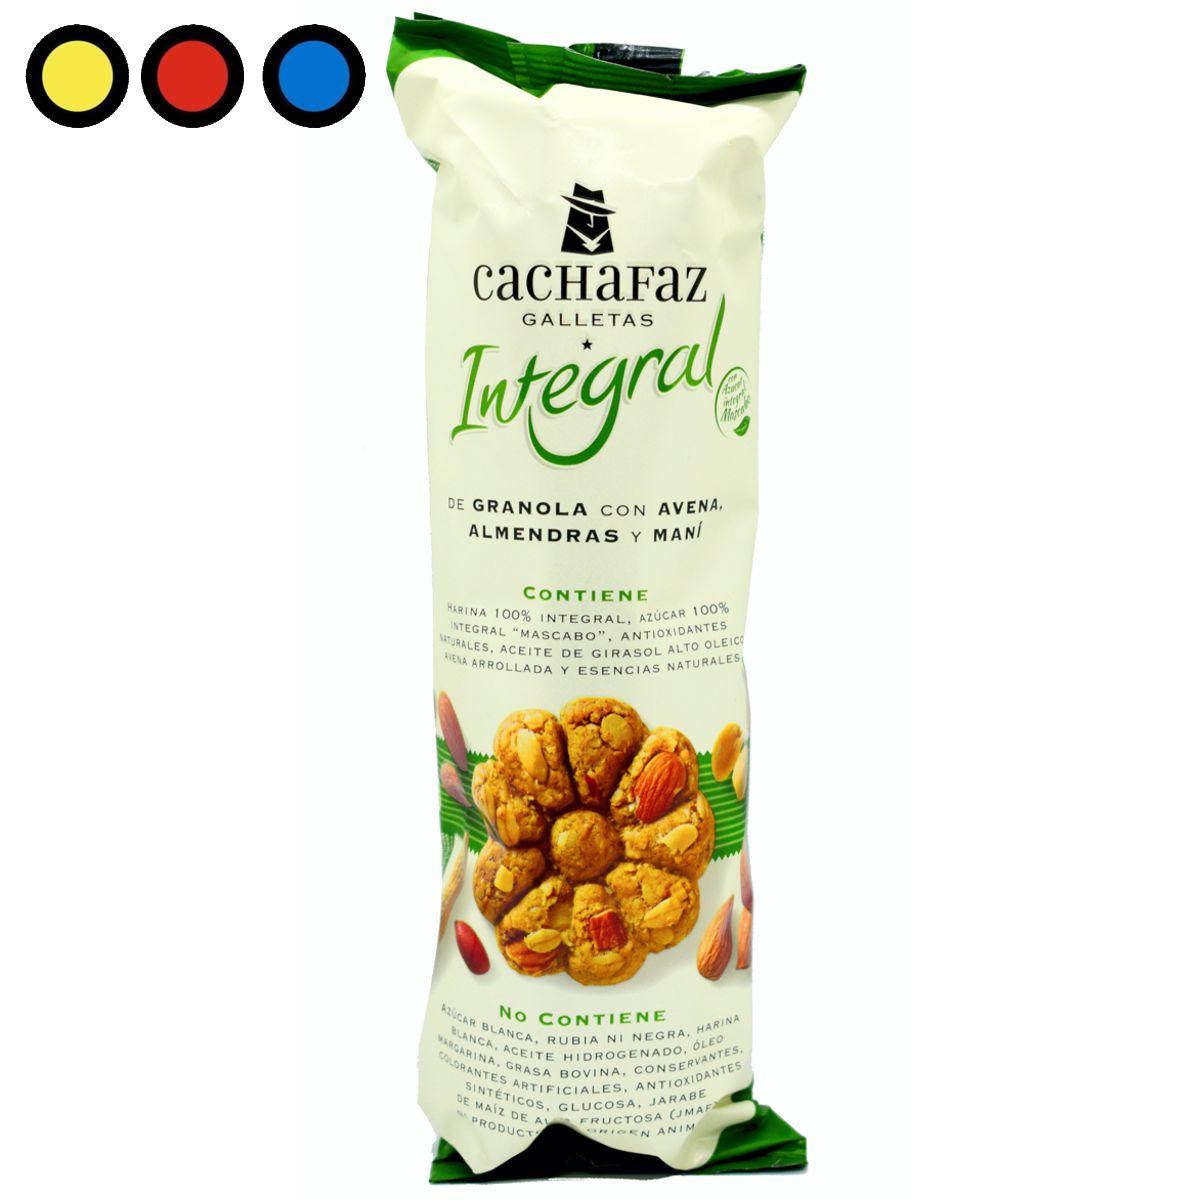 galletitas cachafaz granola venta mayorista